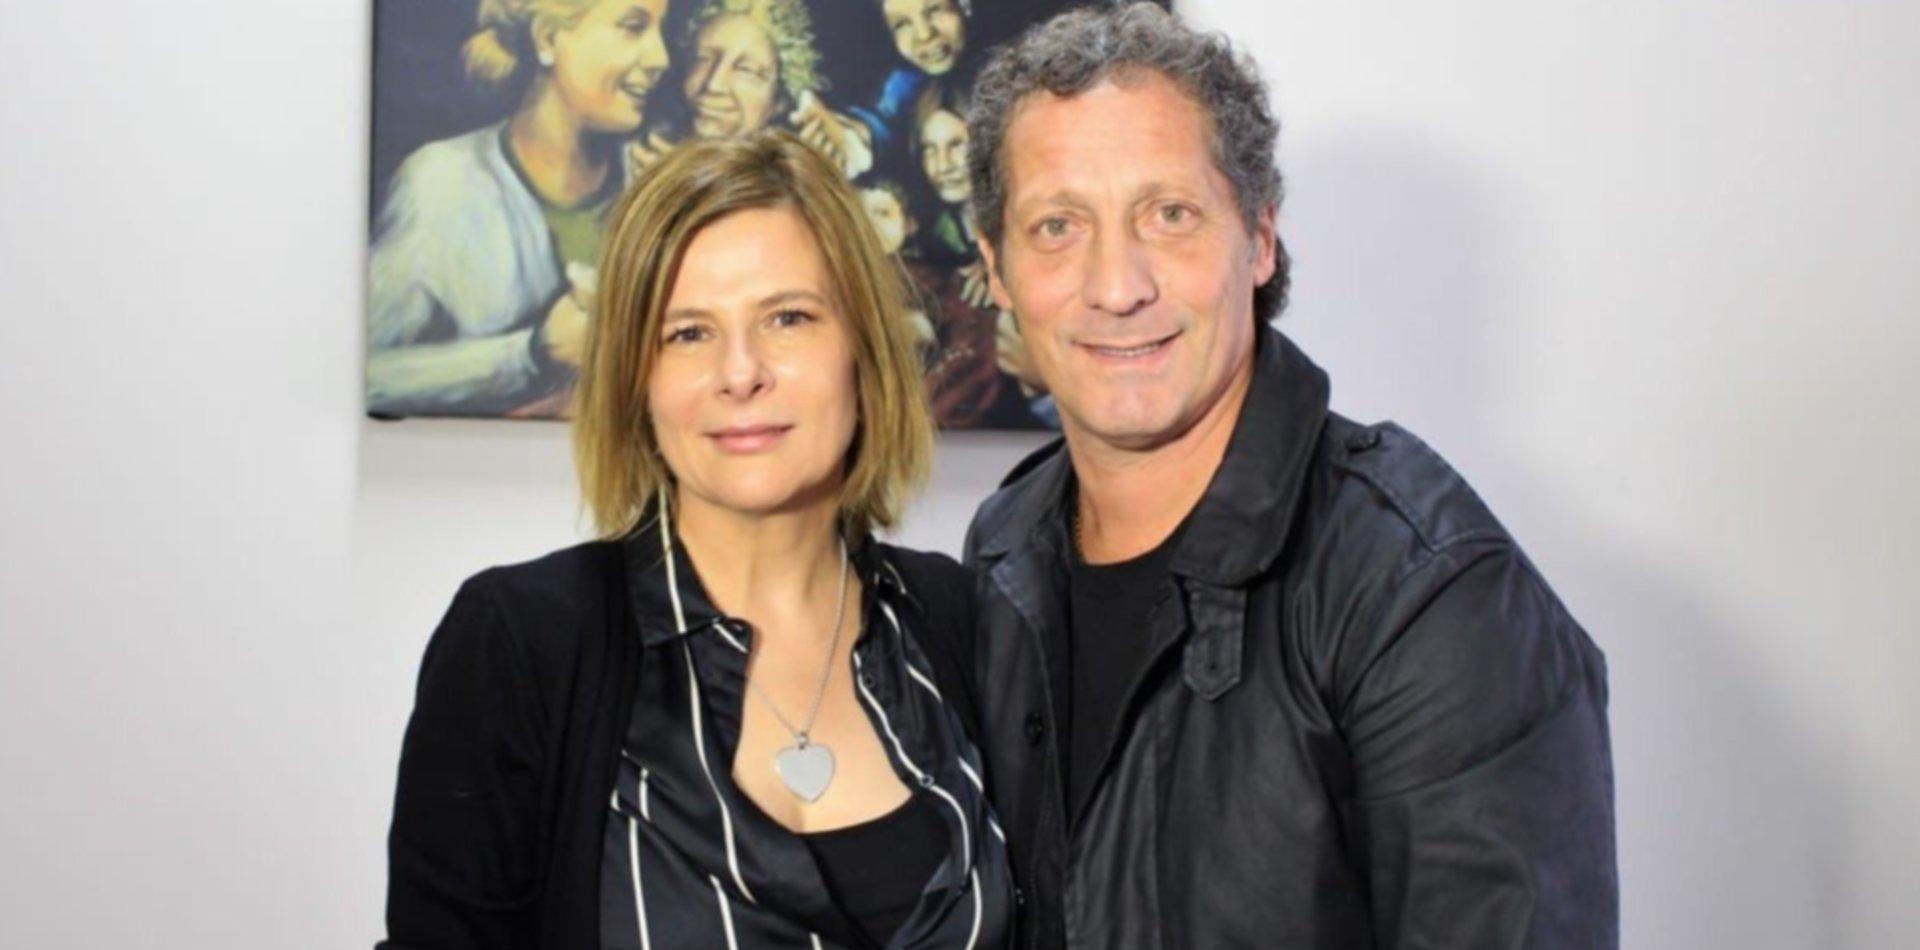 Pedro Troglio se mete en la arena política platense de la mano de Florencia Saintout